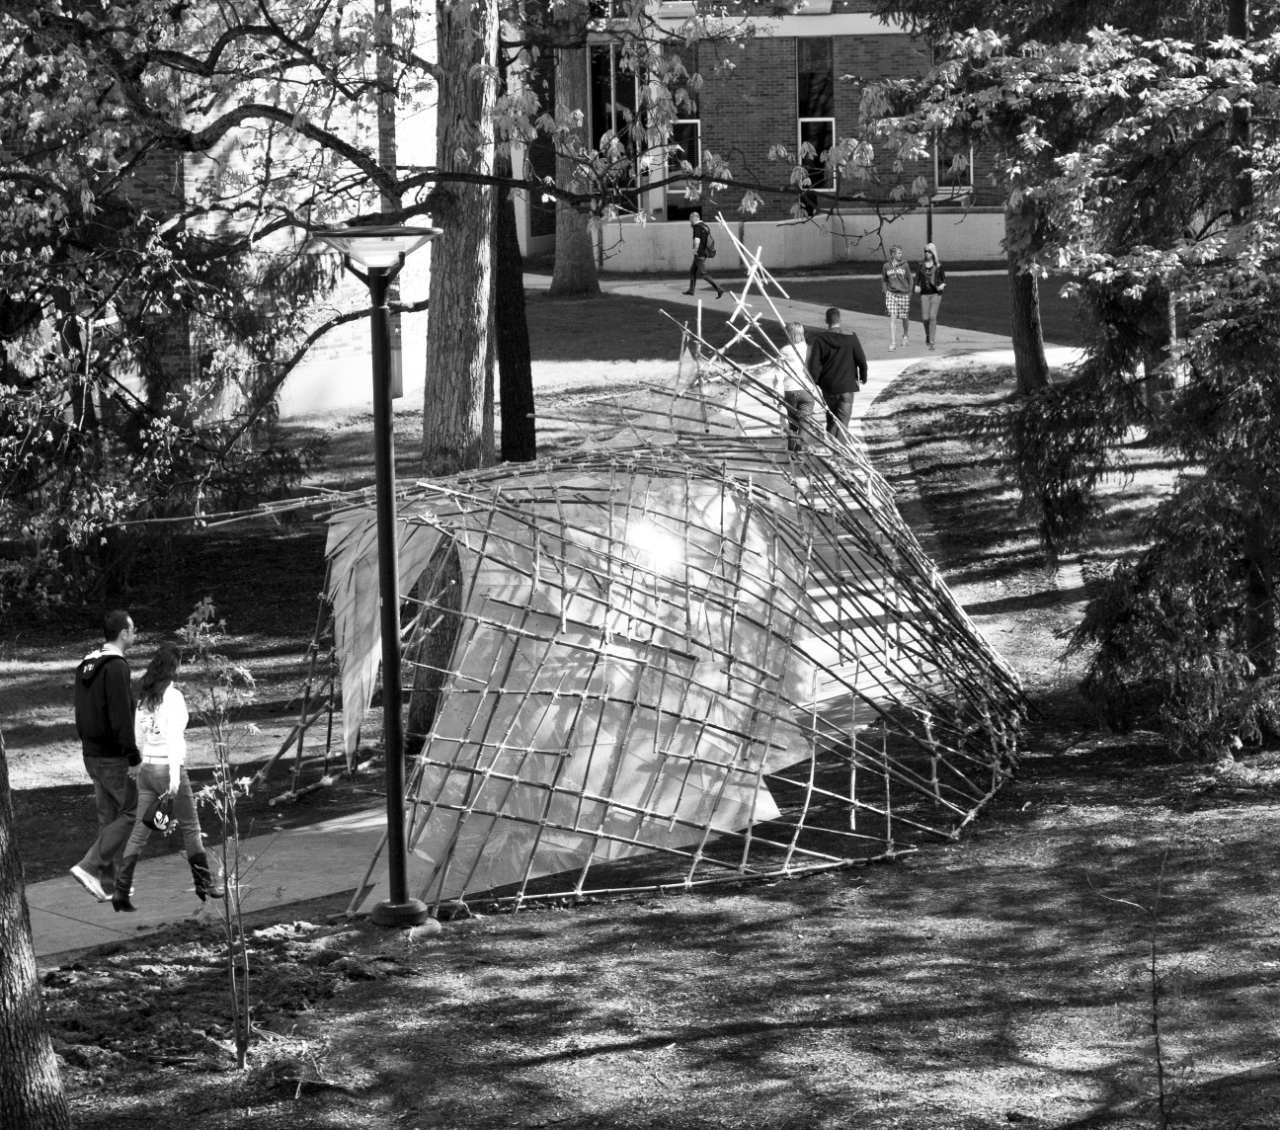 Slipstream Pavilion / David A. Palmieri & Kyle M. Schillaci, © David A. Palmieri